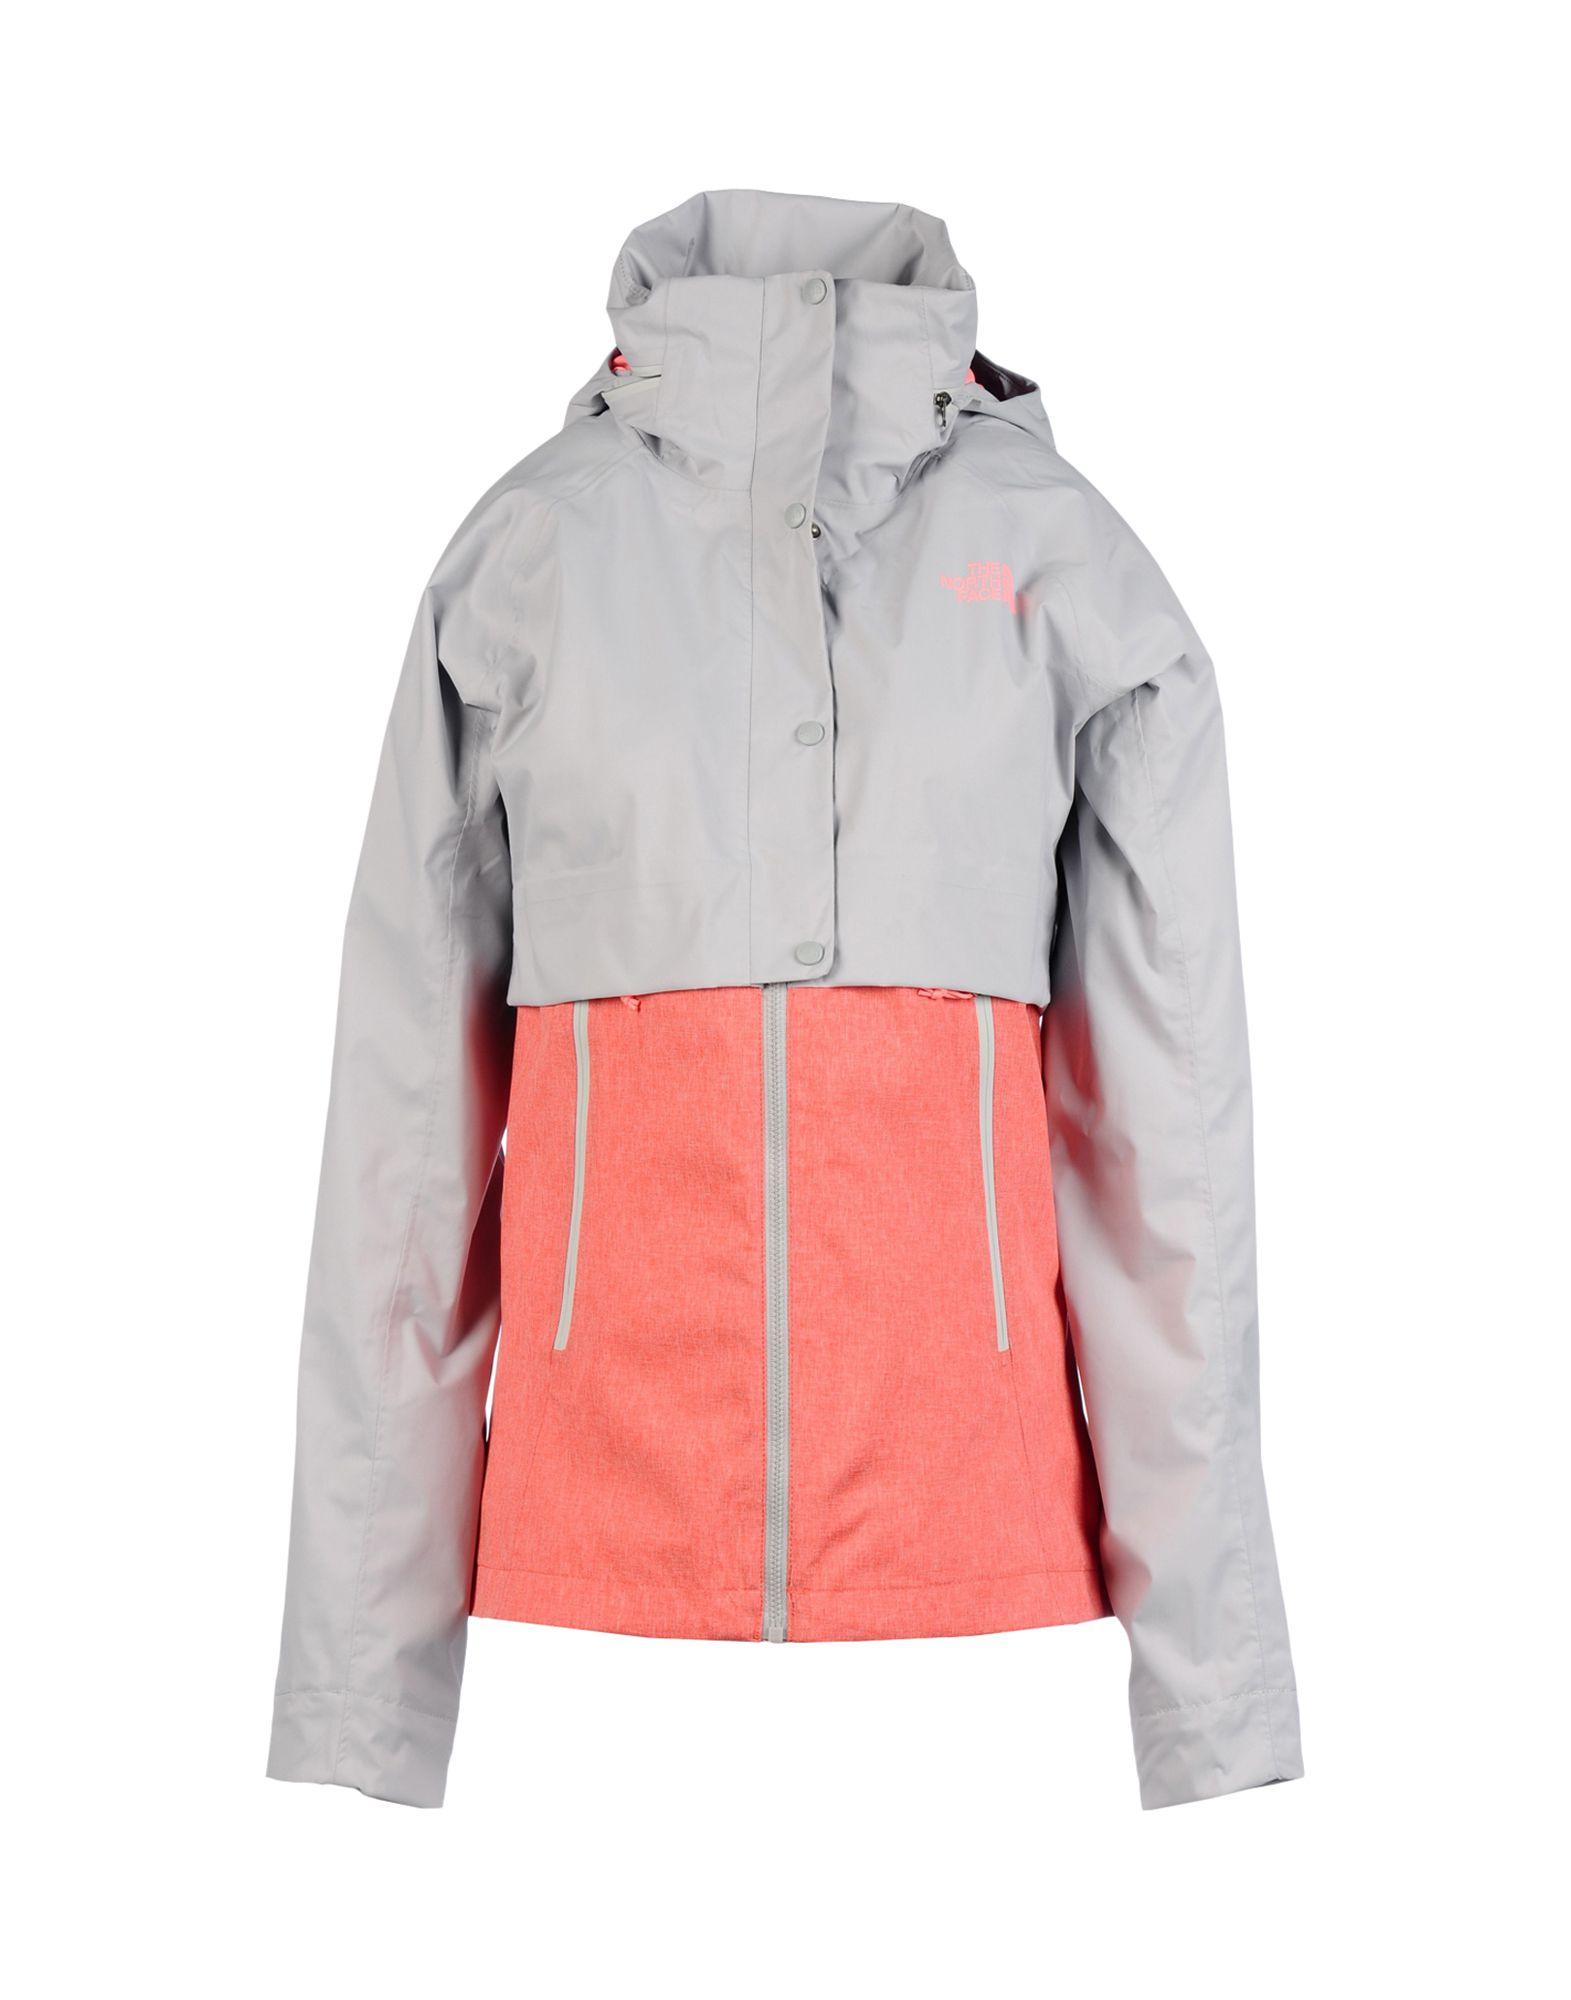 Giubbotto The North Face W Kayenta Jacket 2L Dryvent Waterproof - Donna - Acquista online su U4YhGmdWjW